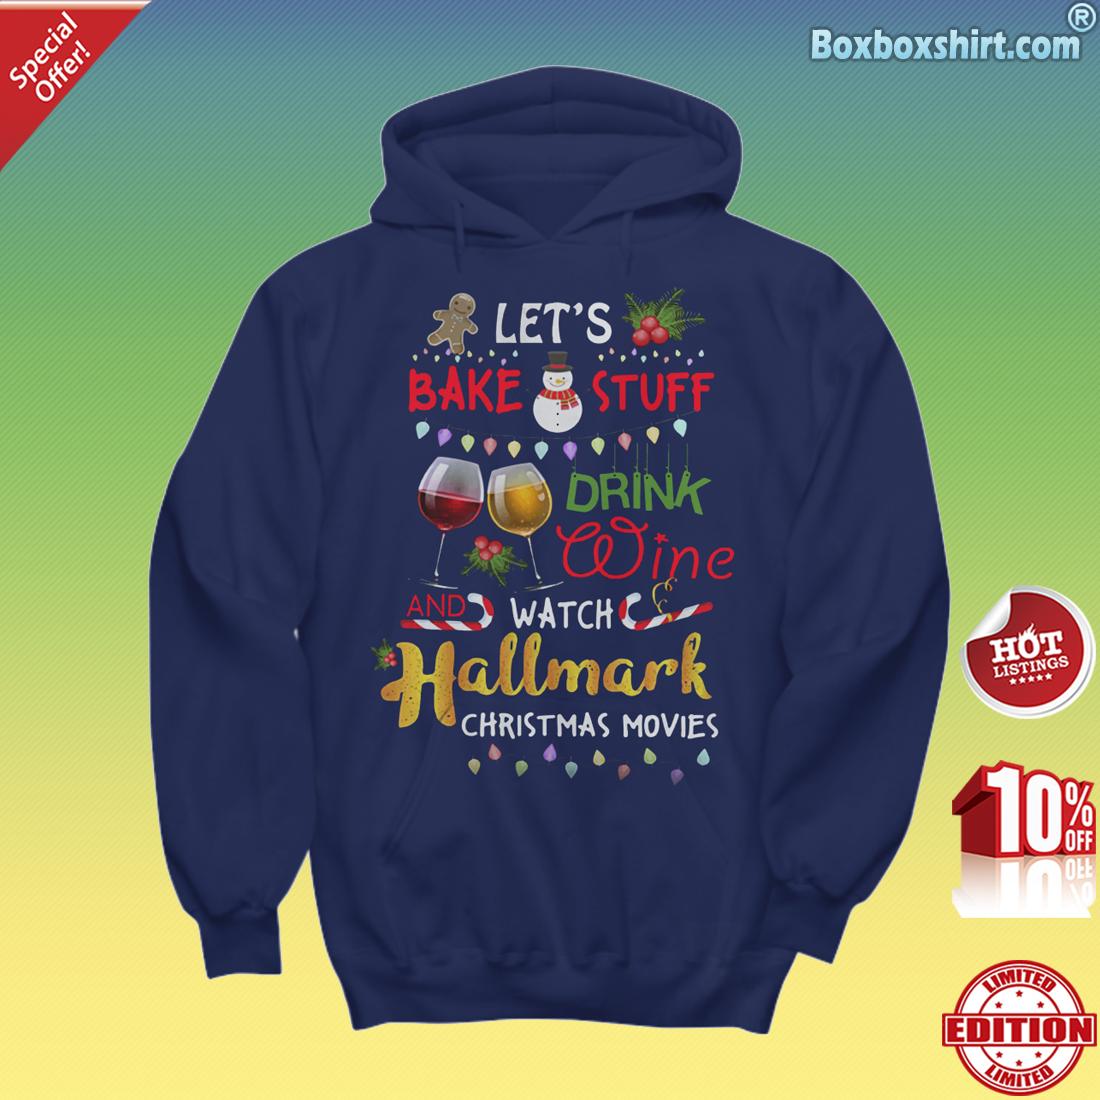 Holiday Home Watching Hallmark Movies Christmas Hoodies Shirt This is My Hallmark Christmas Movie Watching